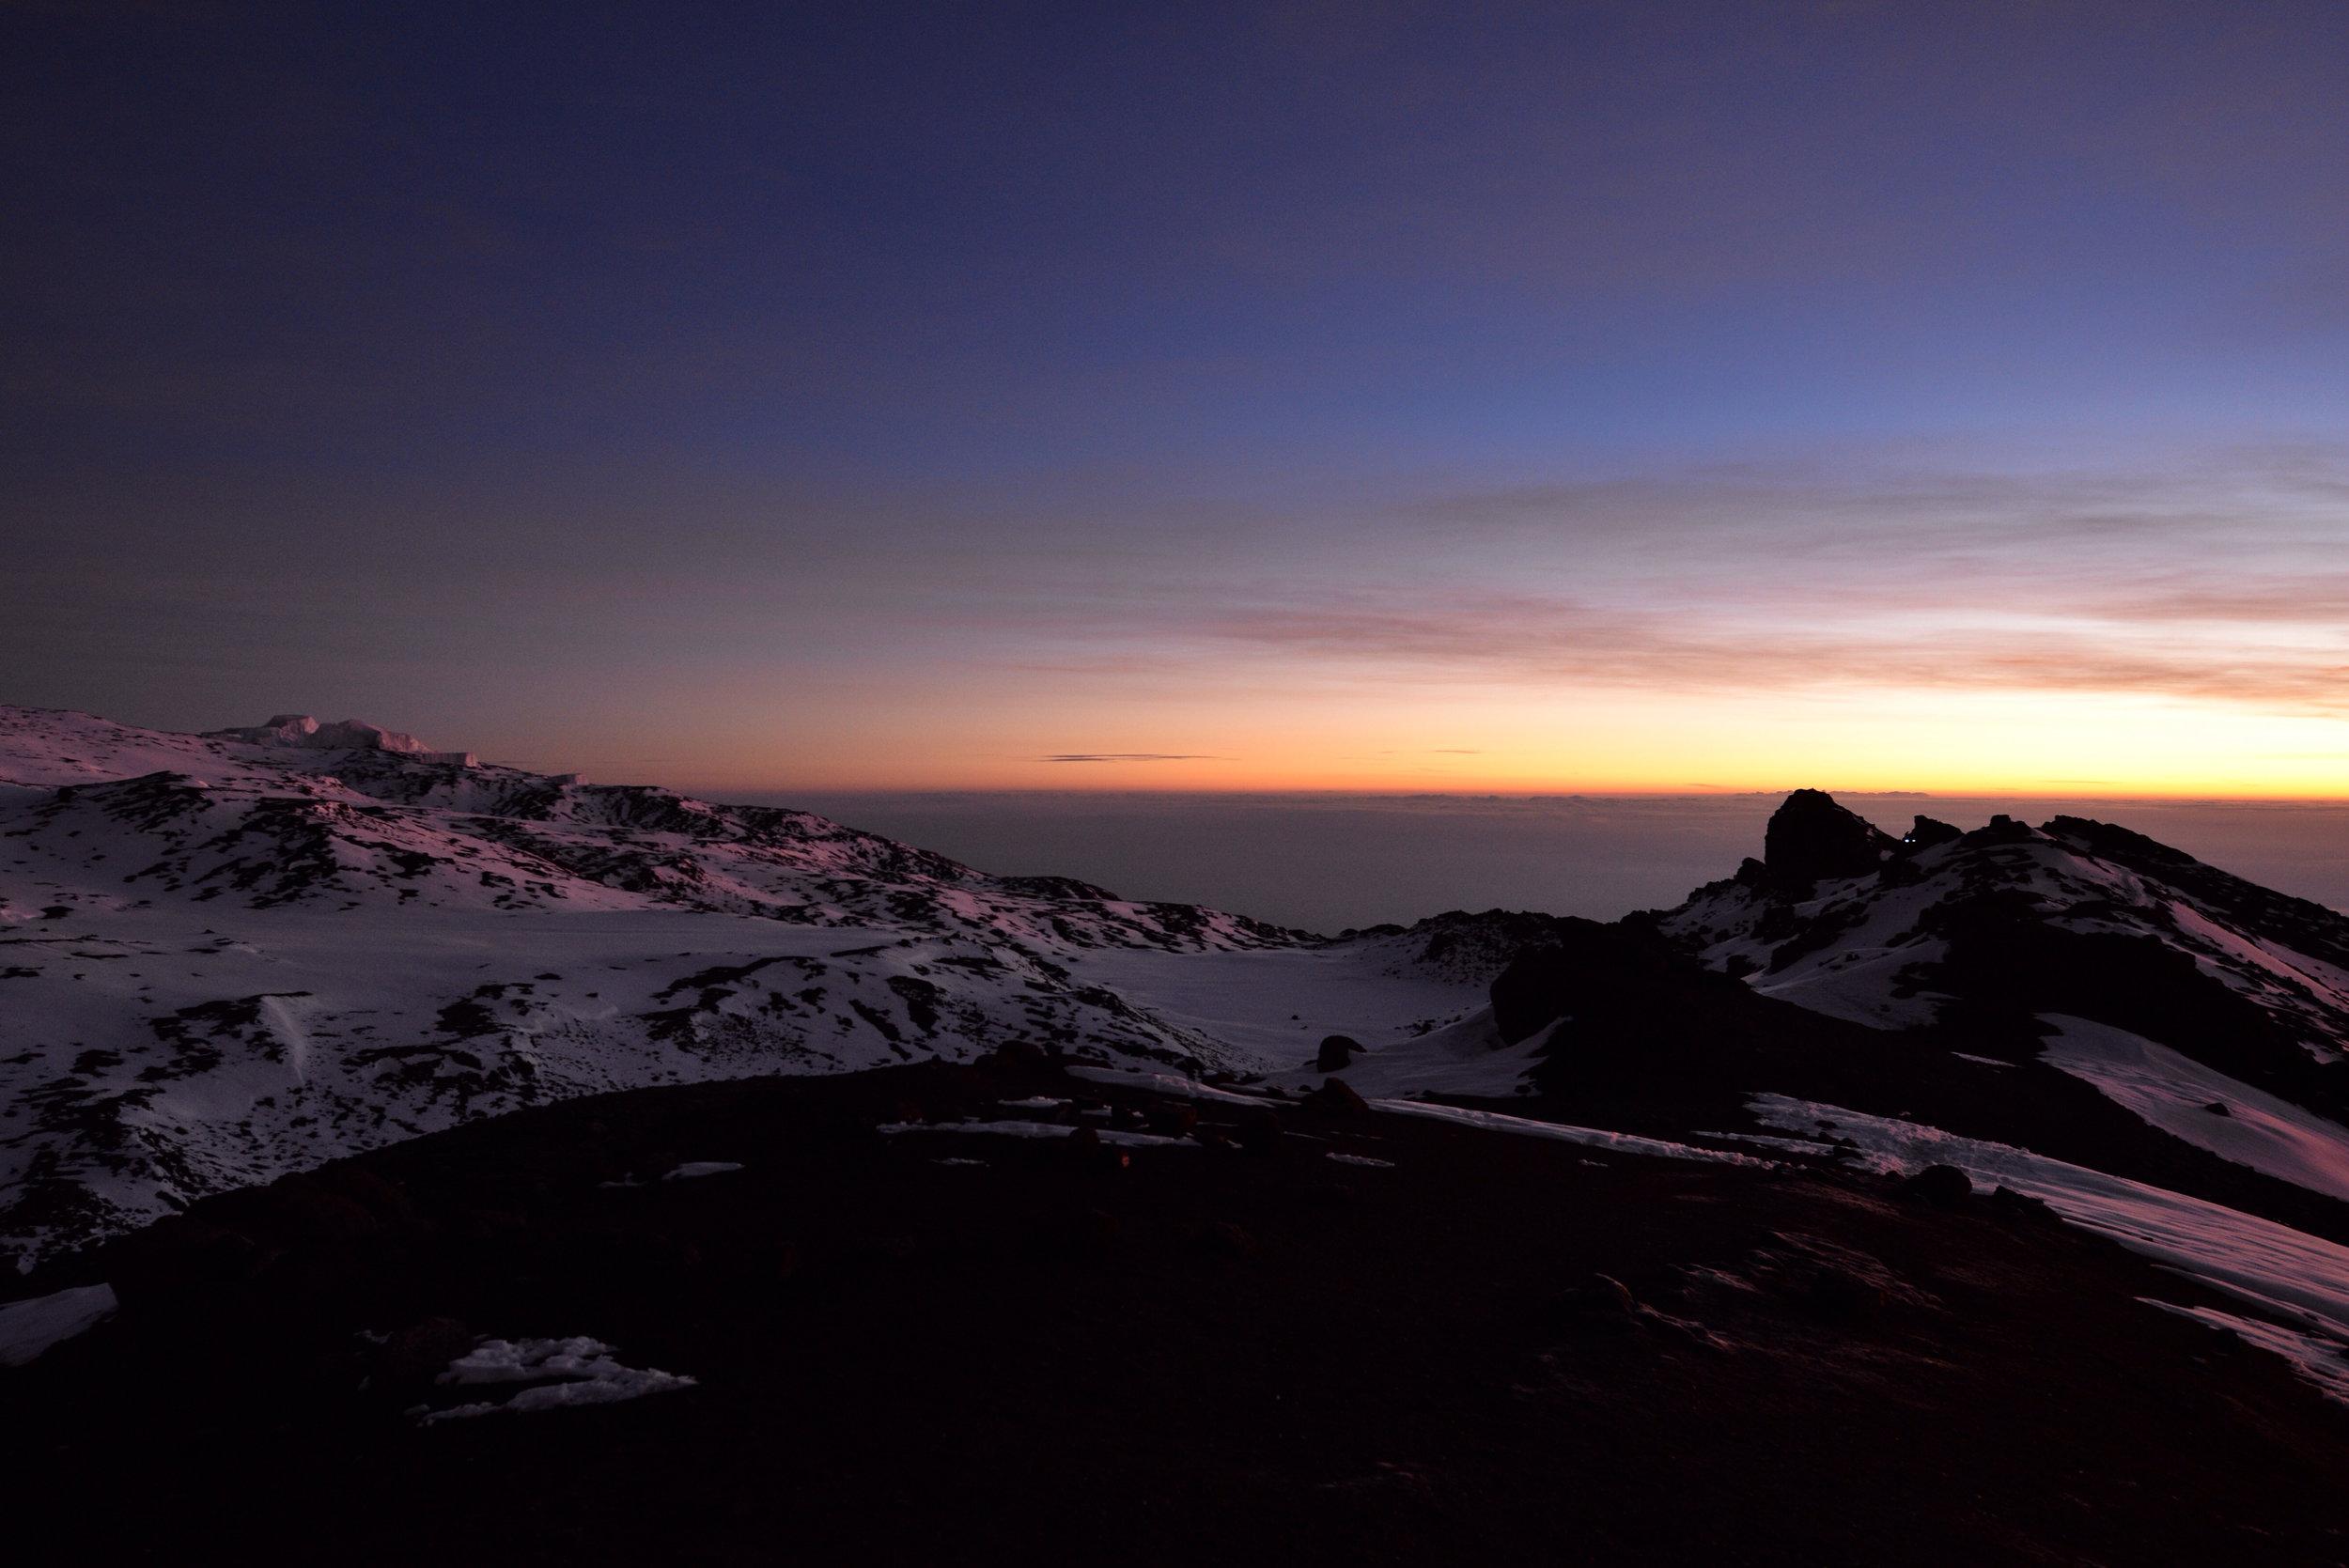 Sunrise Atop Mt. Kilimanjaro, Tanzania